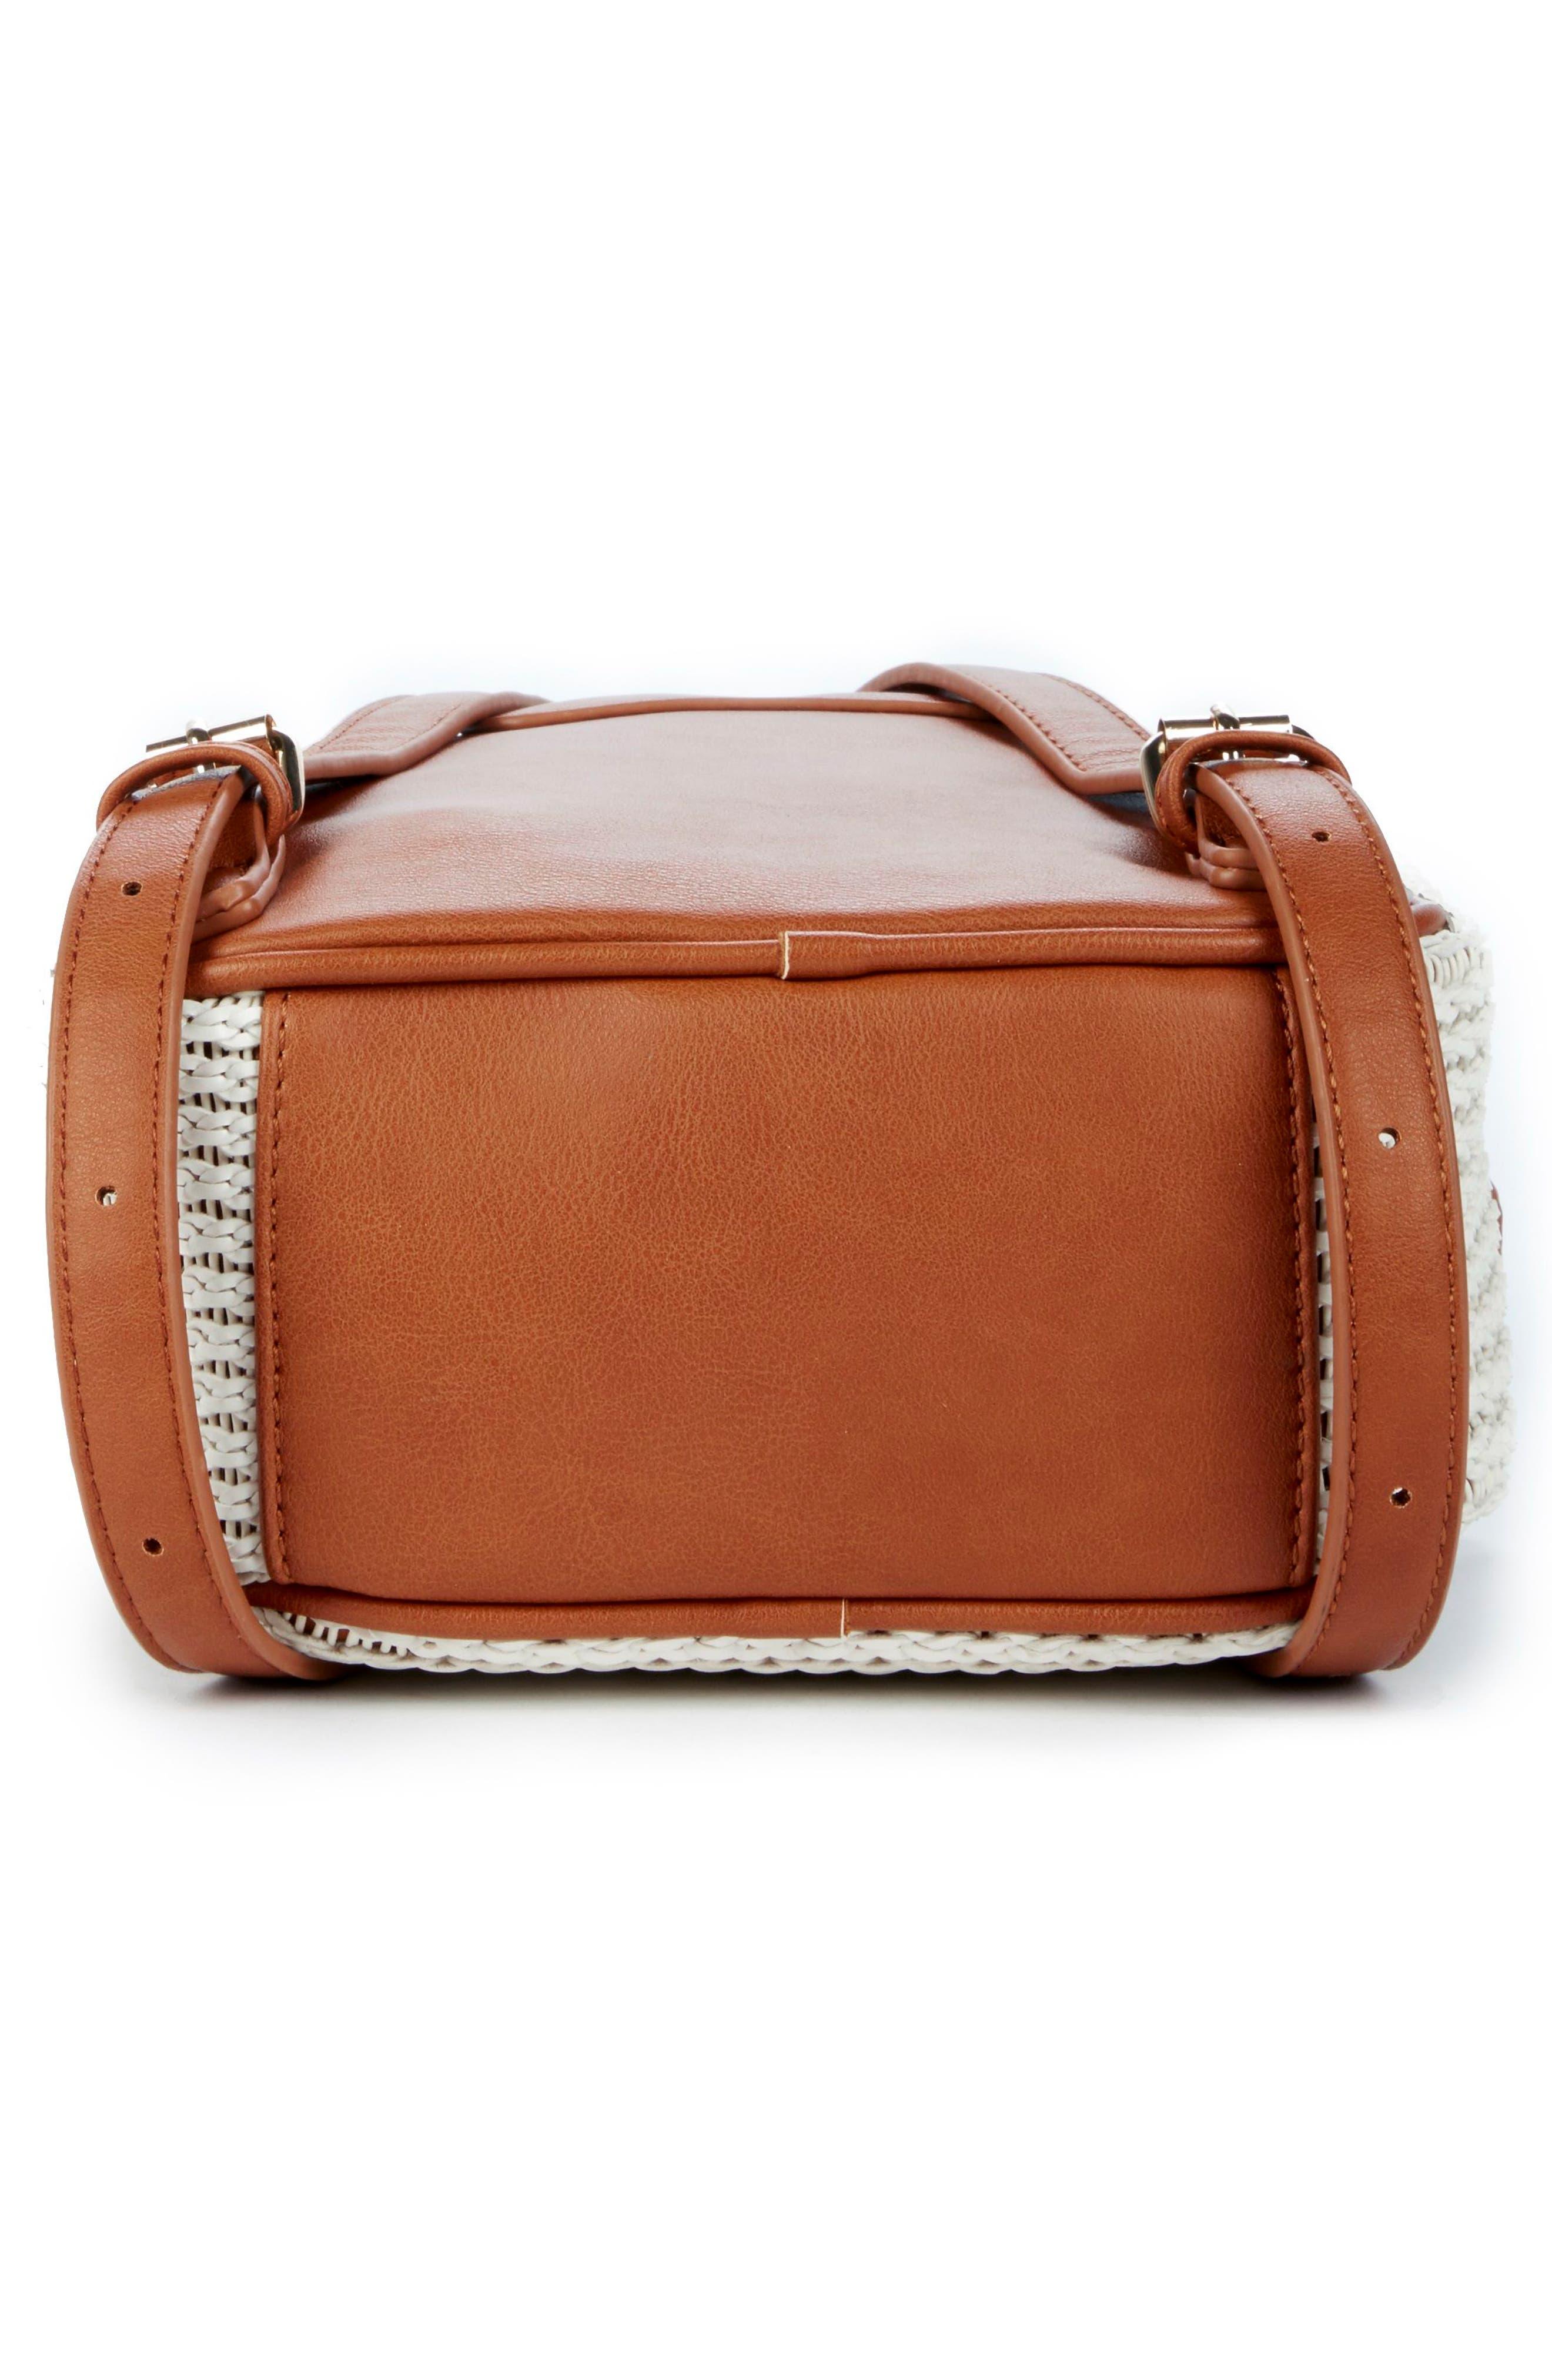 Nikole Faux Leather Backpack,                             Alternate thumbnail 5, color,                             Camel